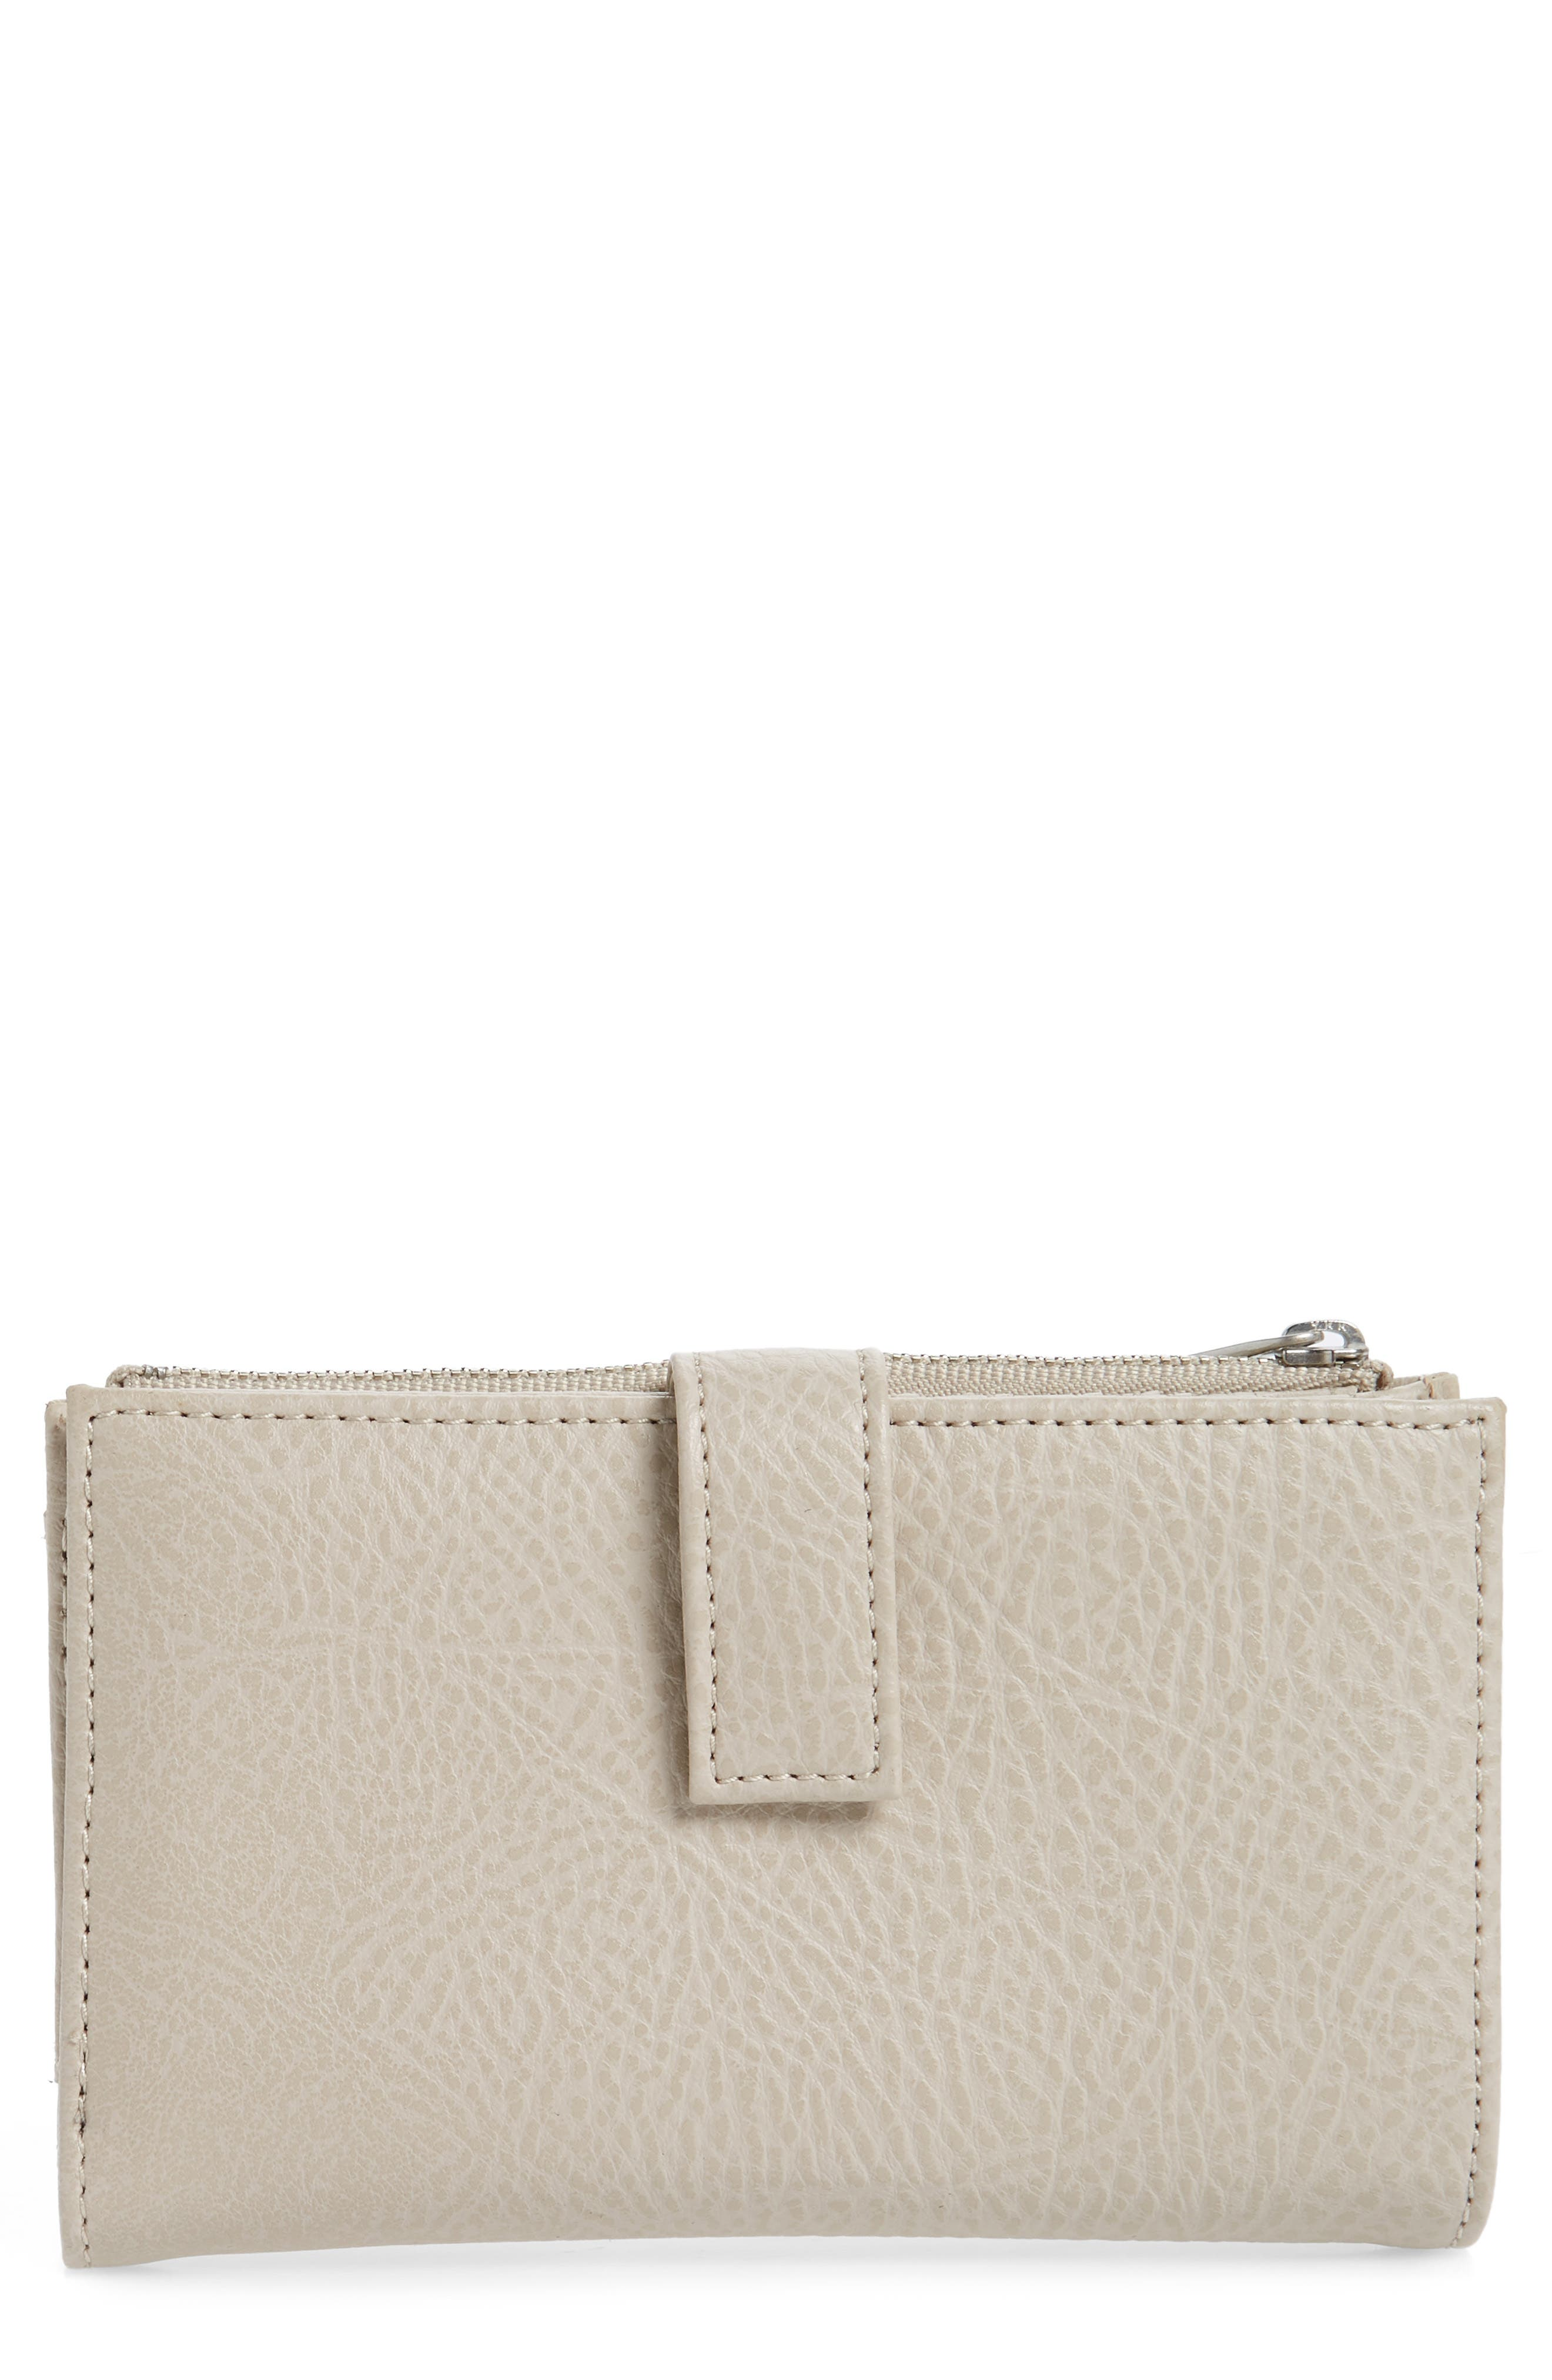 Matt & Nat Small Motiv Faux Leather Wallet -